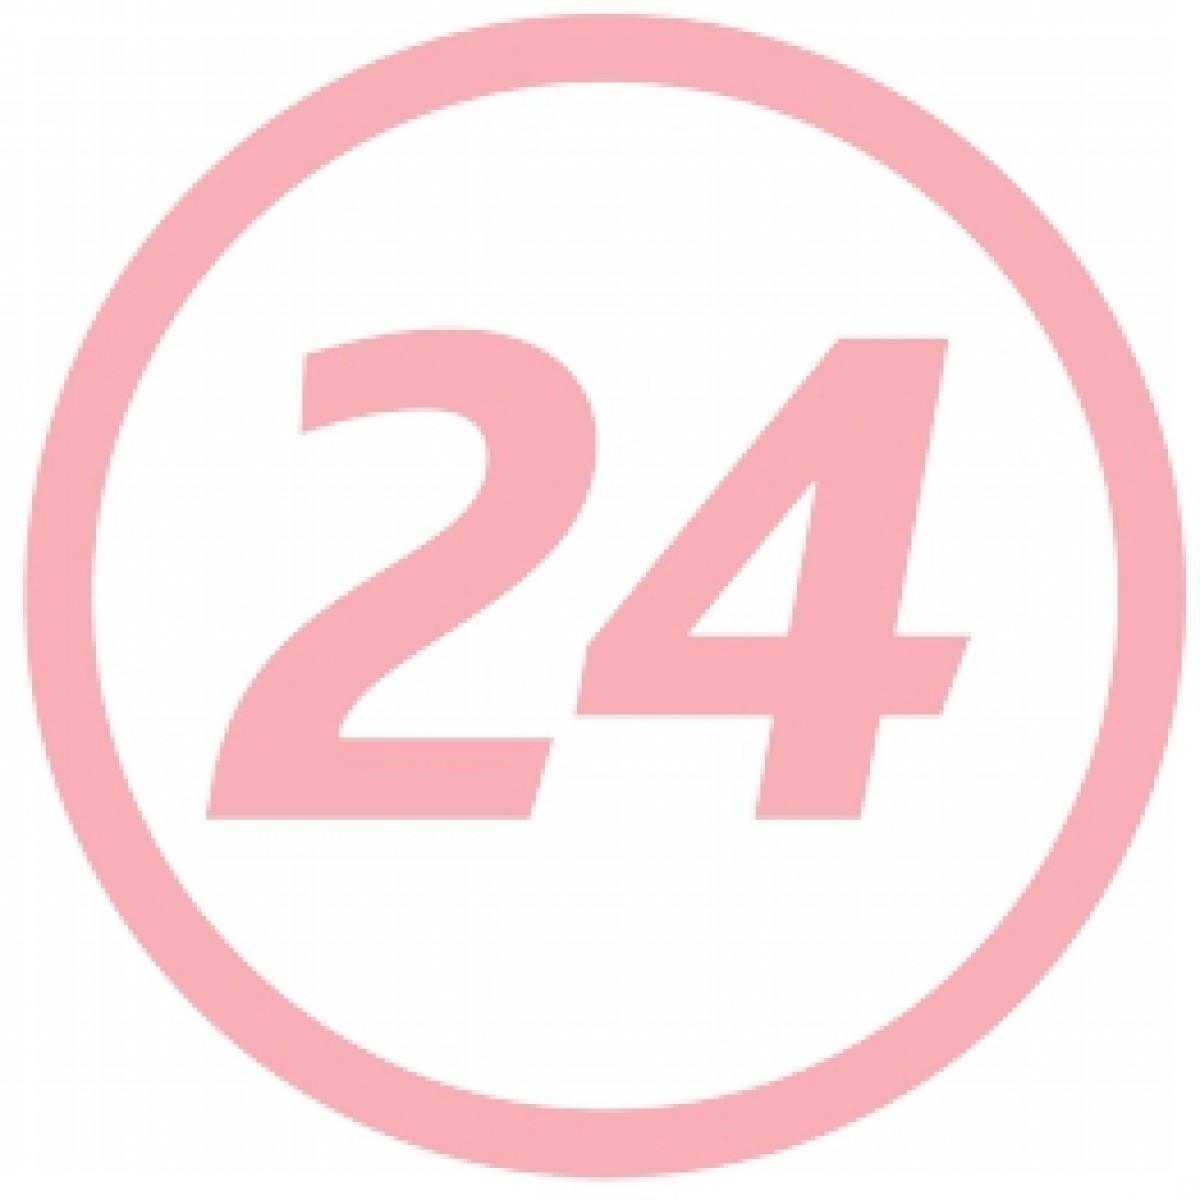 Strepsils Plus Comprimate de Supt, Comprimate De Supt, 24buc